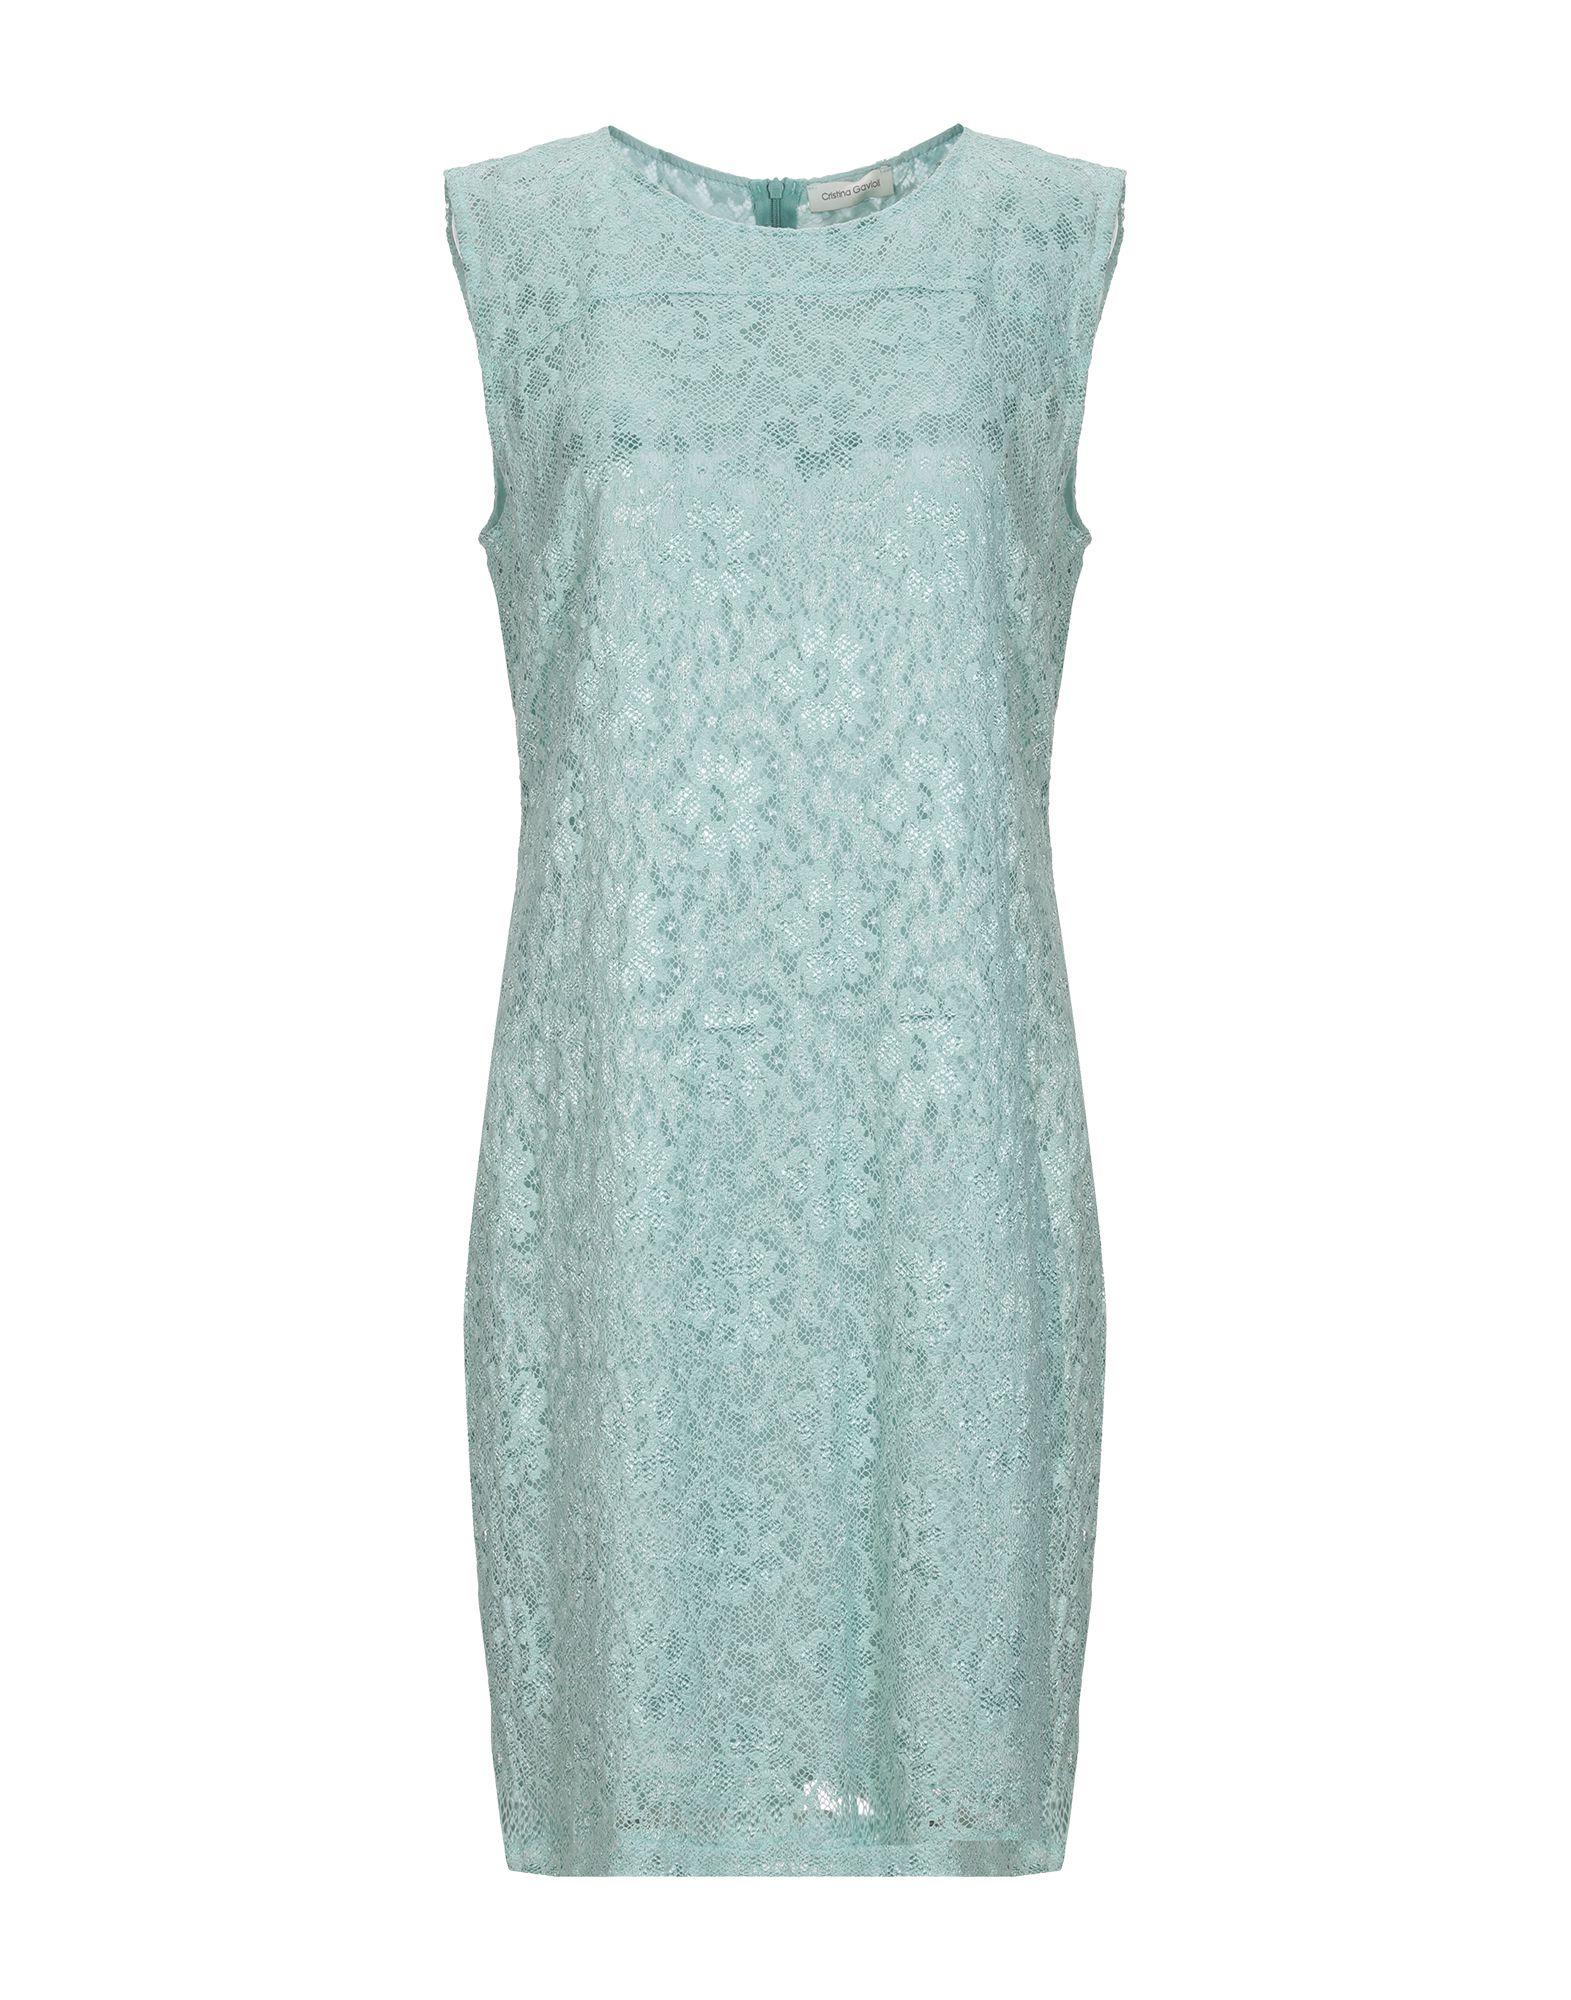 CRISTINA GAVIOLI Платье до колена платье cristina gavioli платья и сарафаны мини короткие